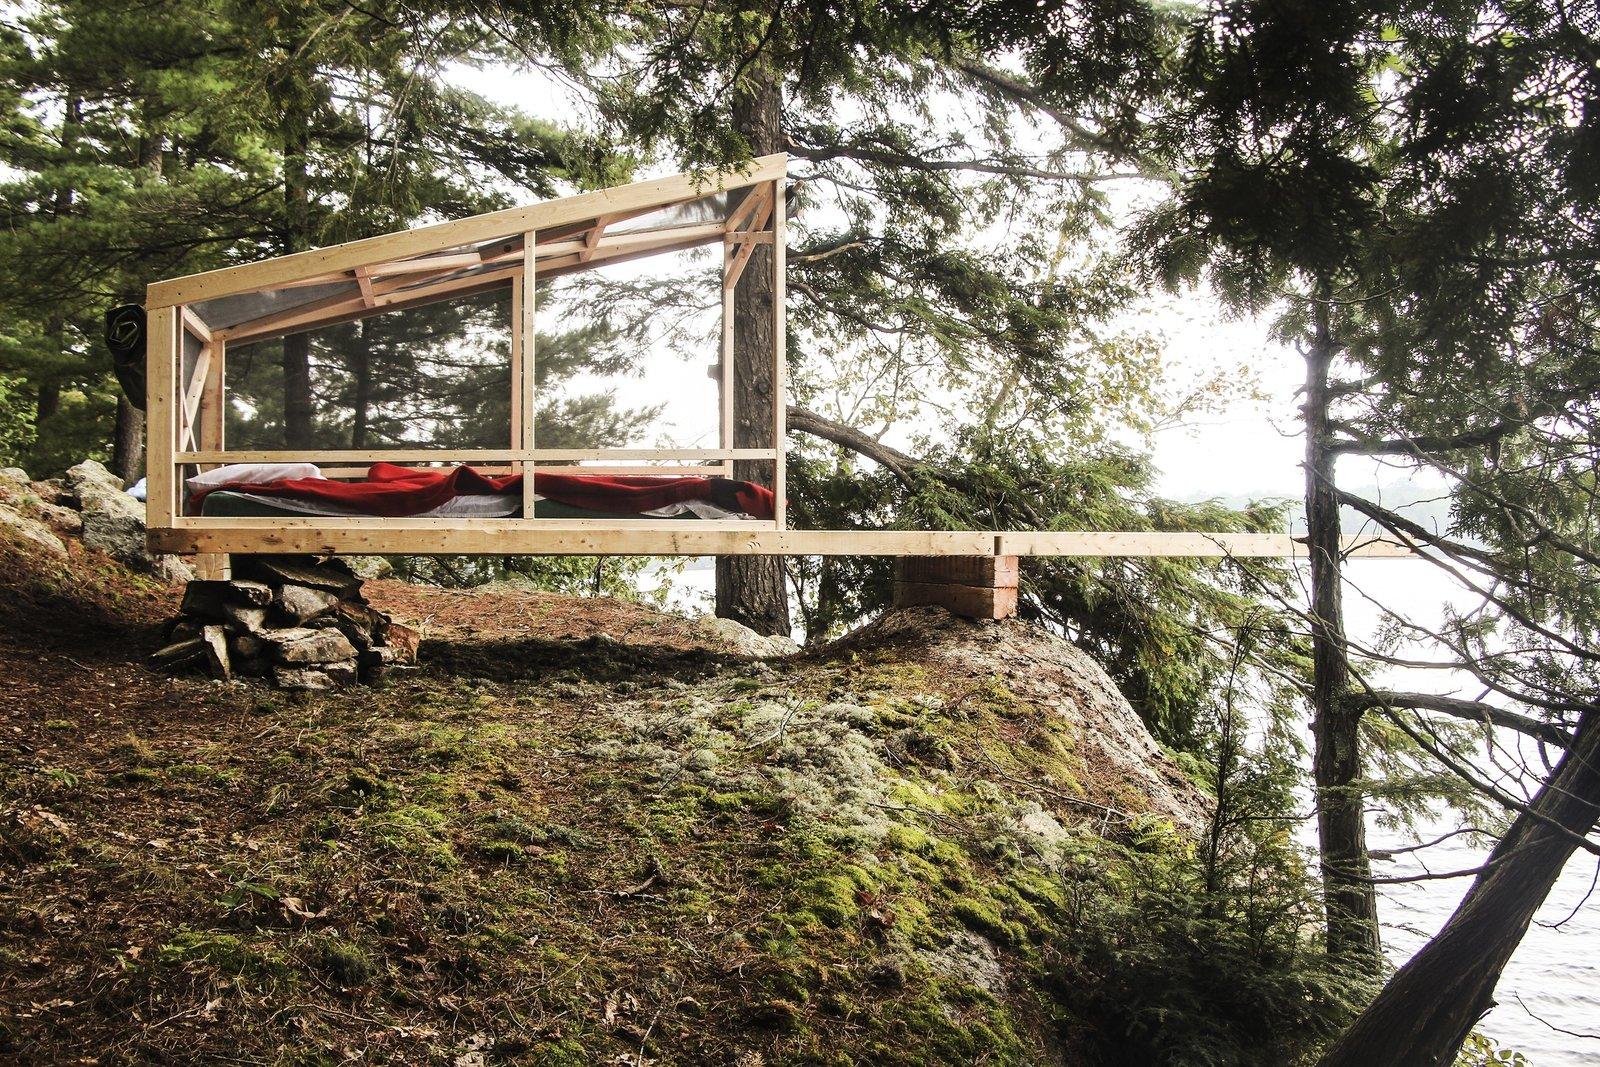 Photo 2 of 6 in Dream/Dive Platform Encourages Playful Summer Living